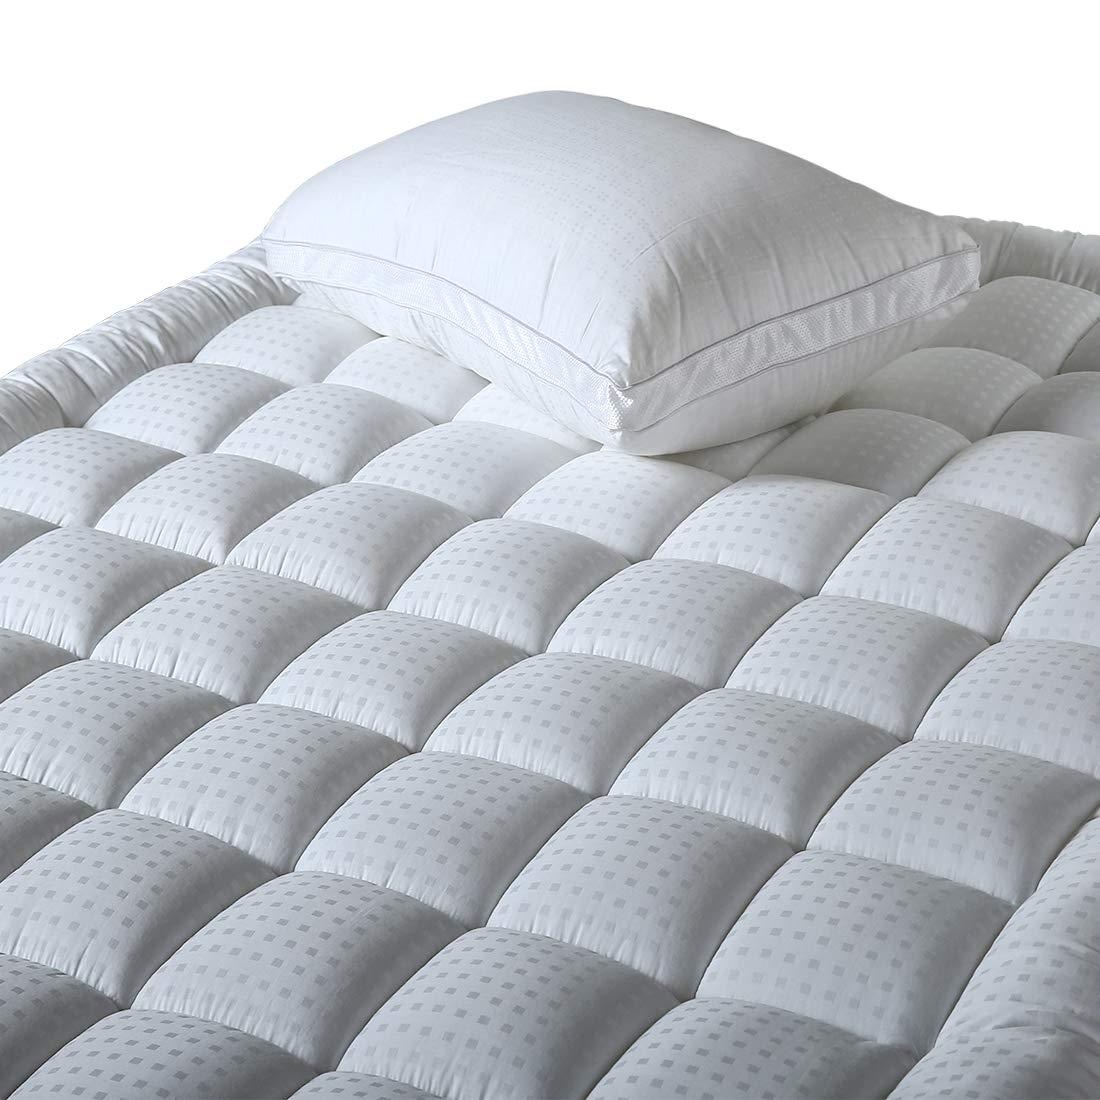 Balichun Mattress Pad Cover Queen Size Pillowtop 300TC Down Alternative Mattress Topper with 8-21-Inch Deep Pocket